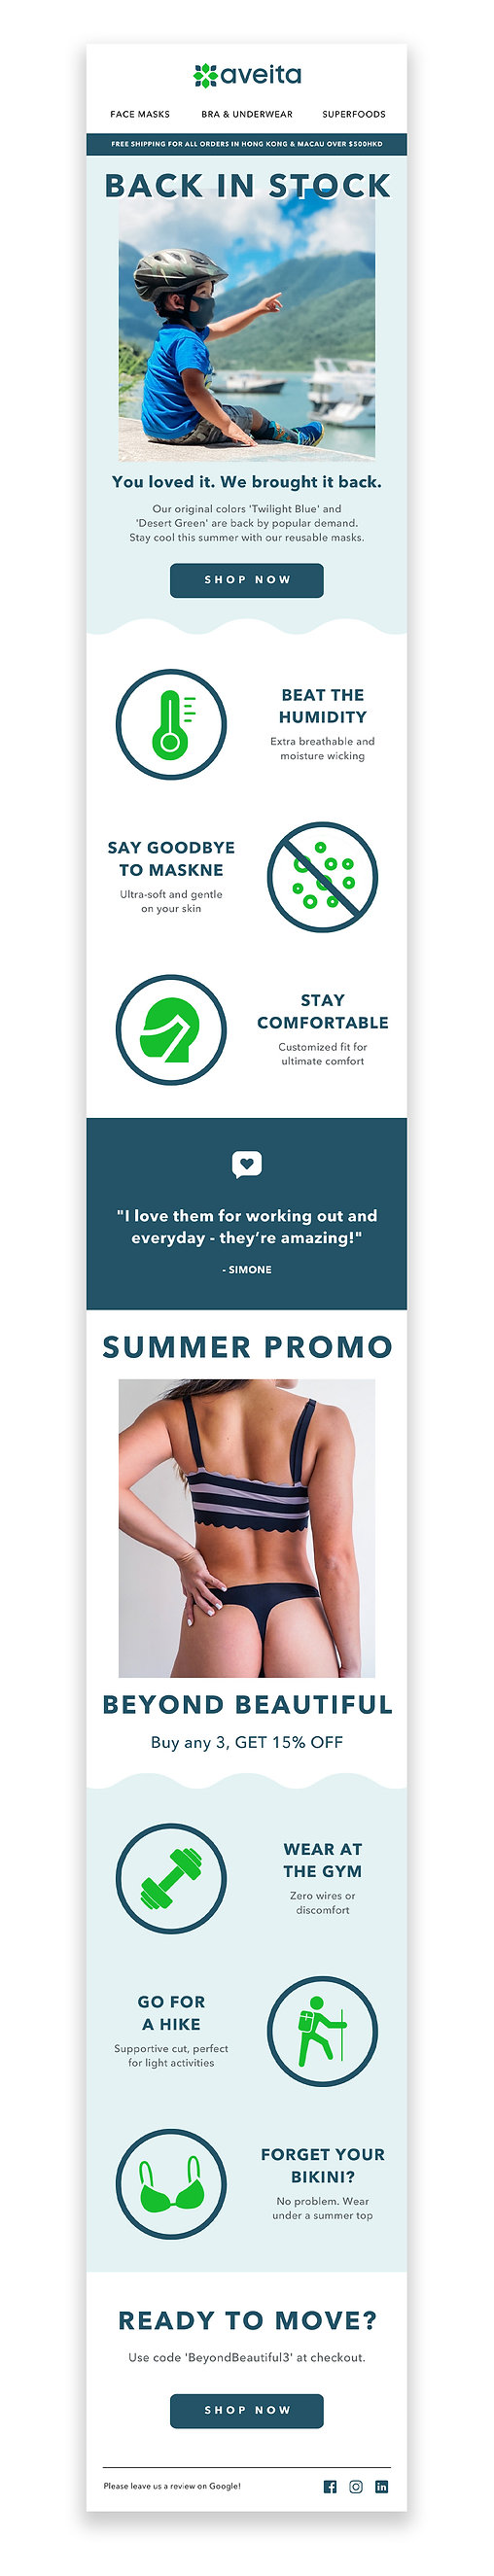 Aveita-Summer-Campaign-Newsletter.jpg